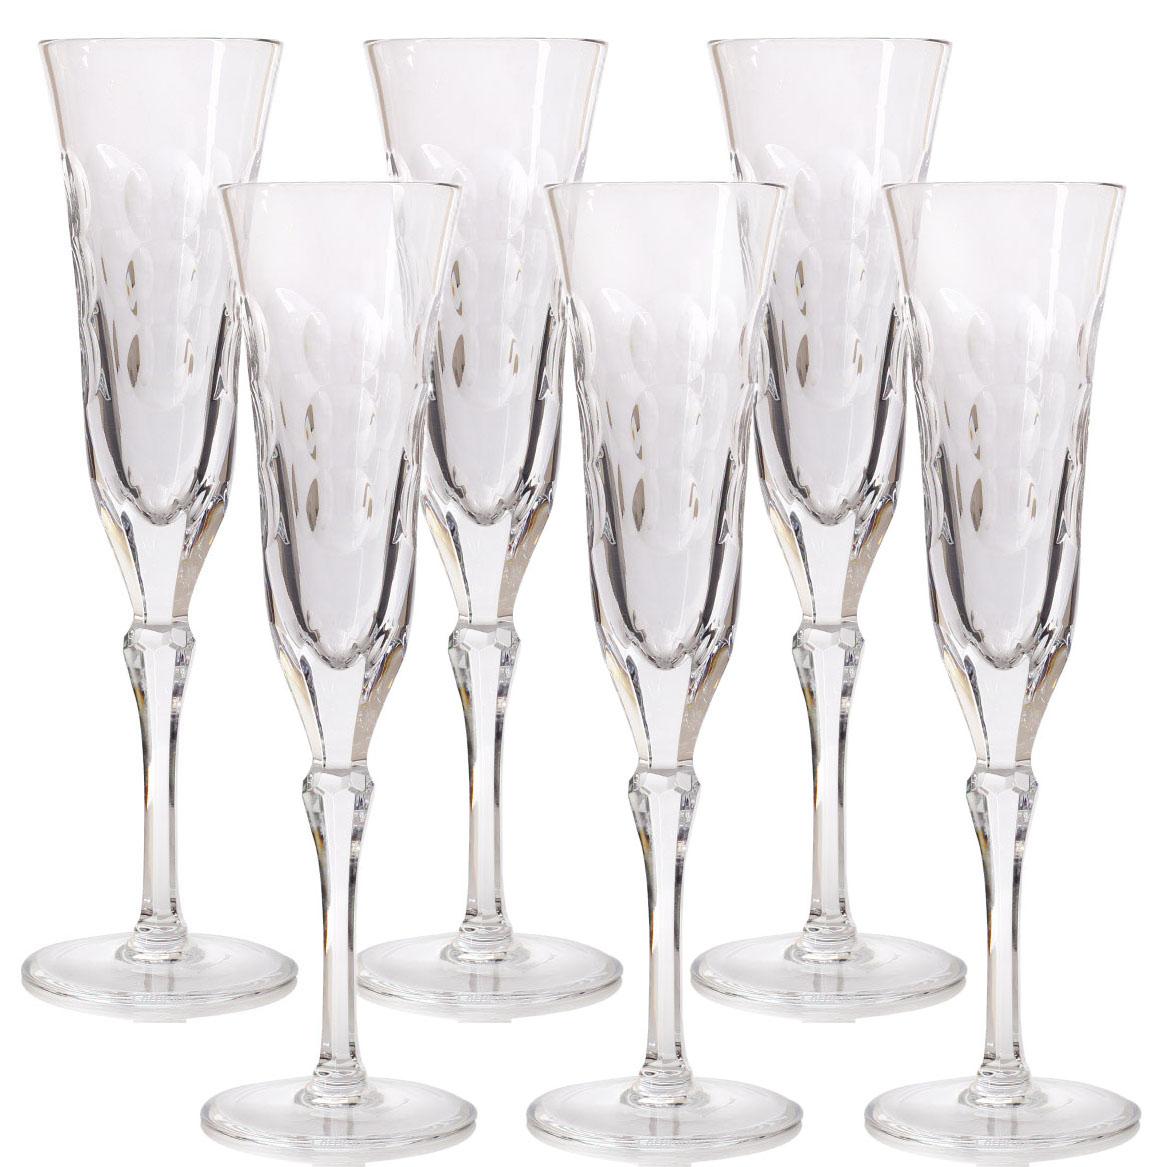 Хрустальные бокалы для шампанского Christofle Kawali